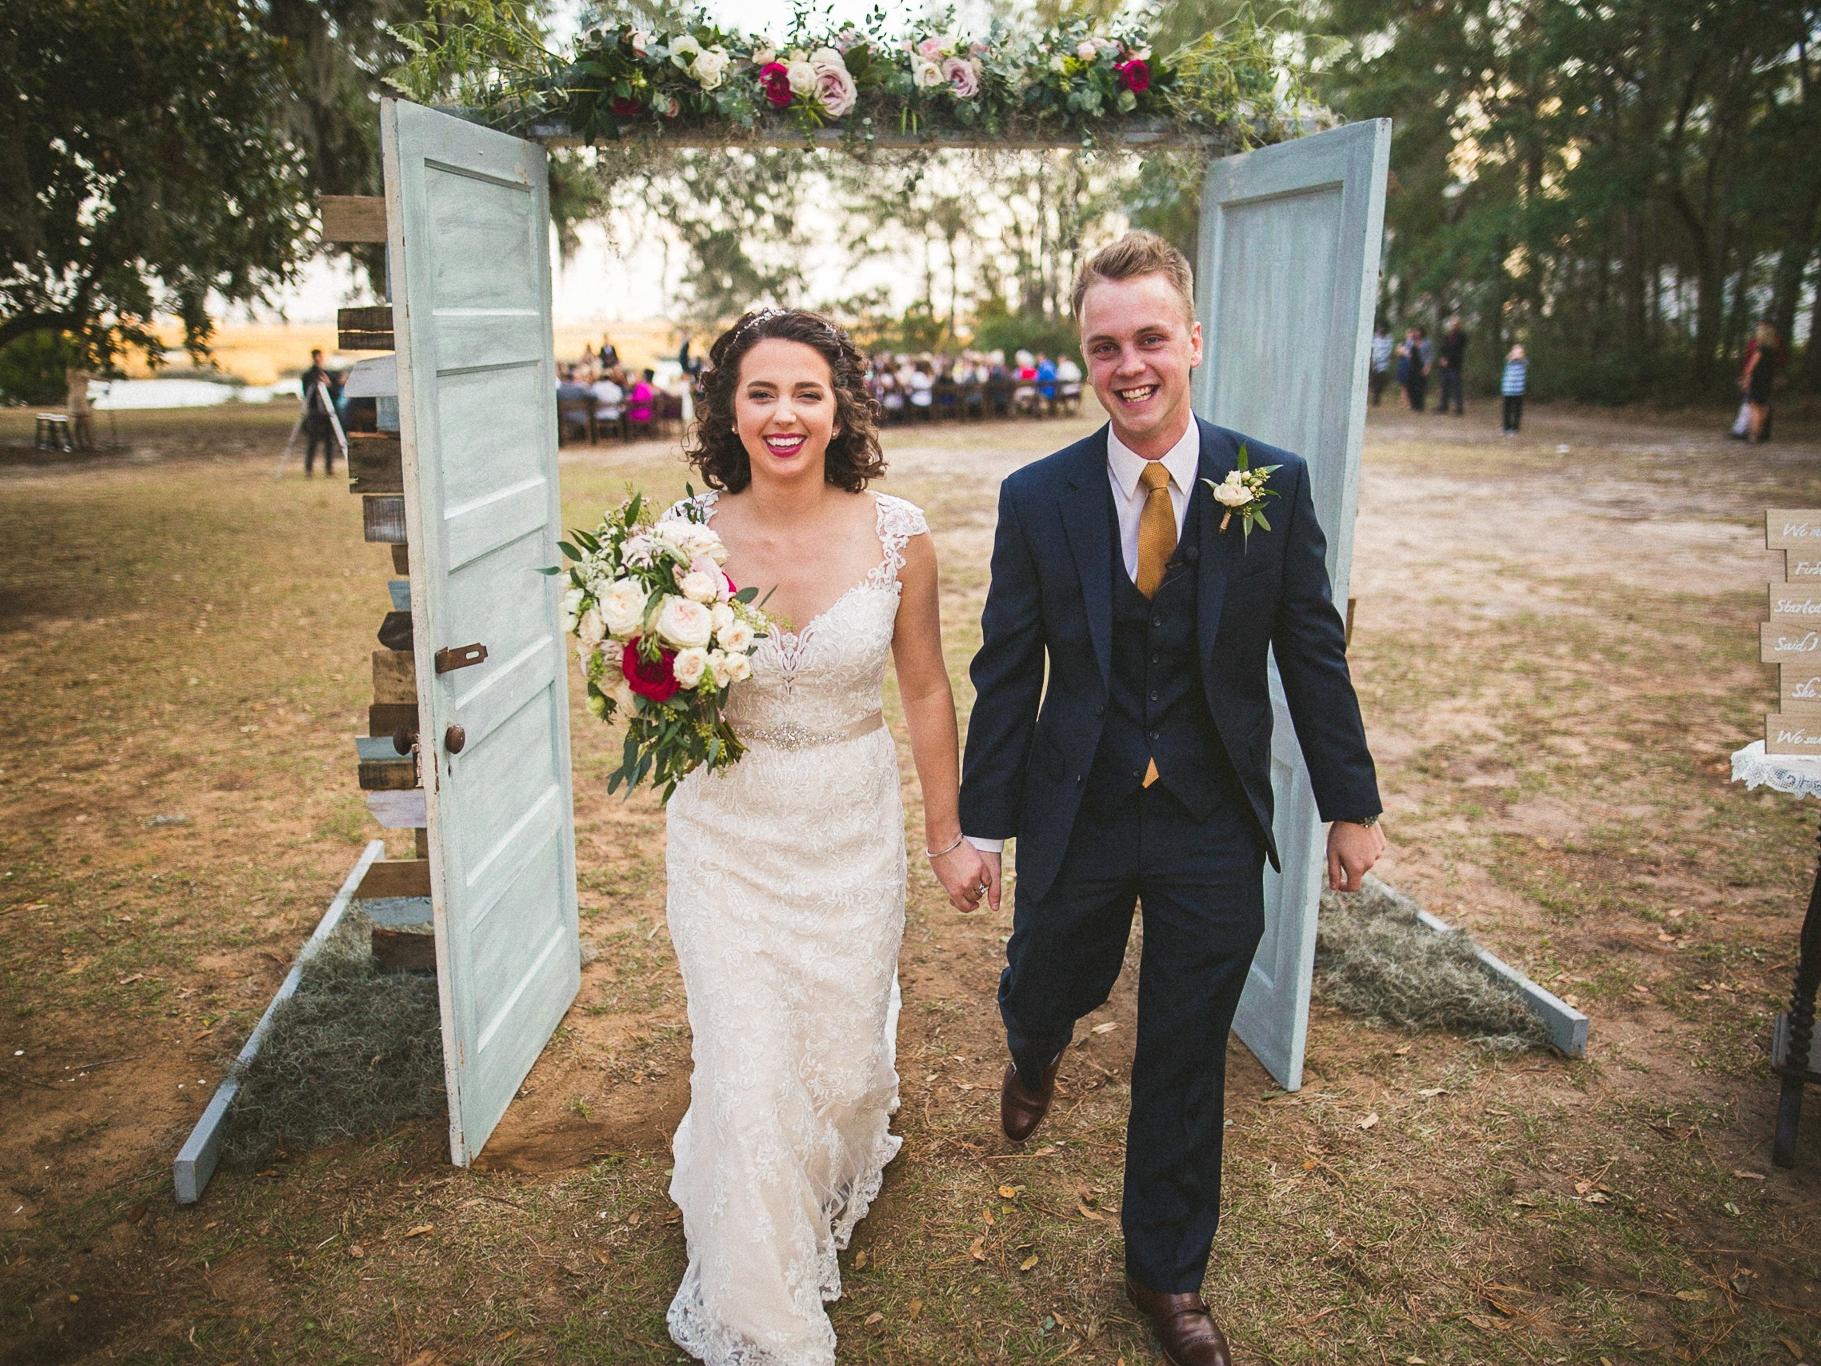 Elizabeth & Nate // Sunnyside Plantation Wedding - Murrells Inlet, SC 11.18.2016